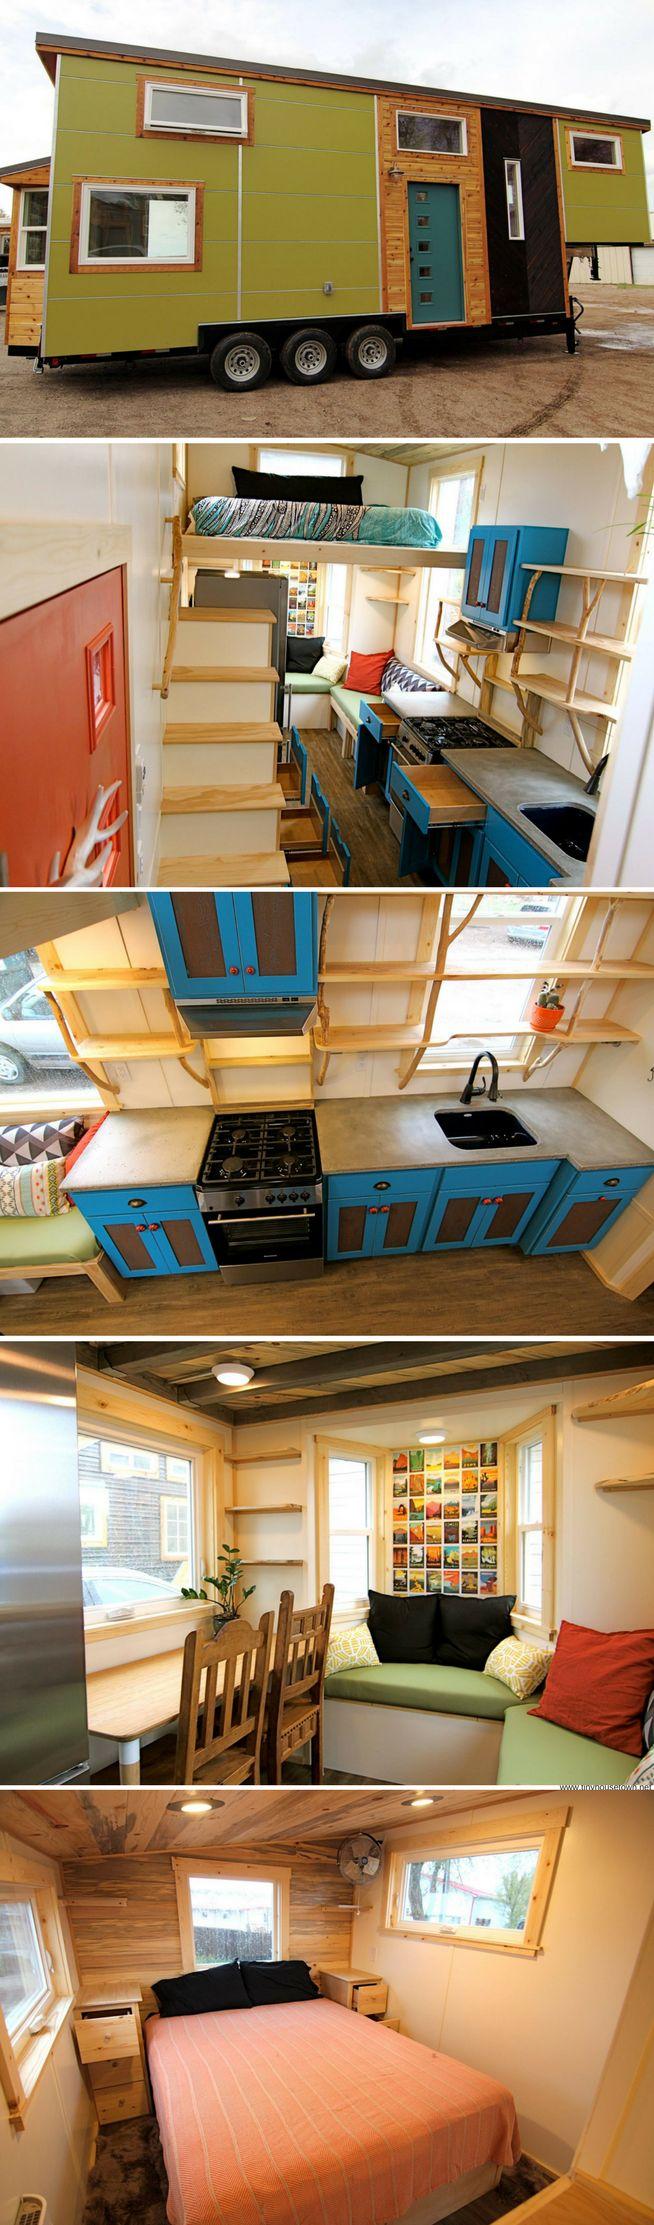 A tiny house built onto a 31' gooseneck trailer